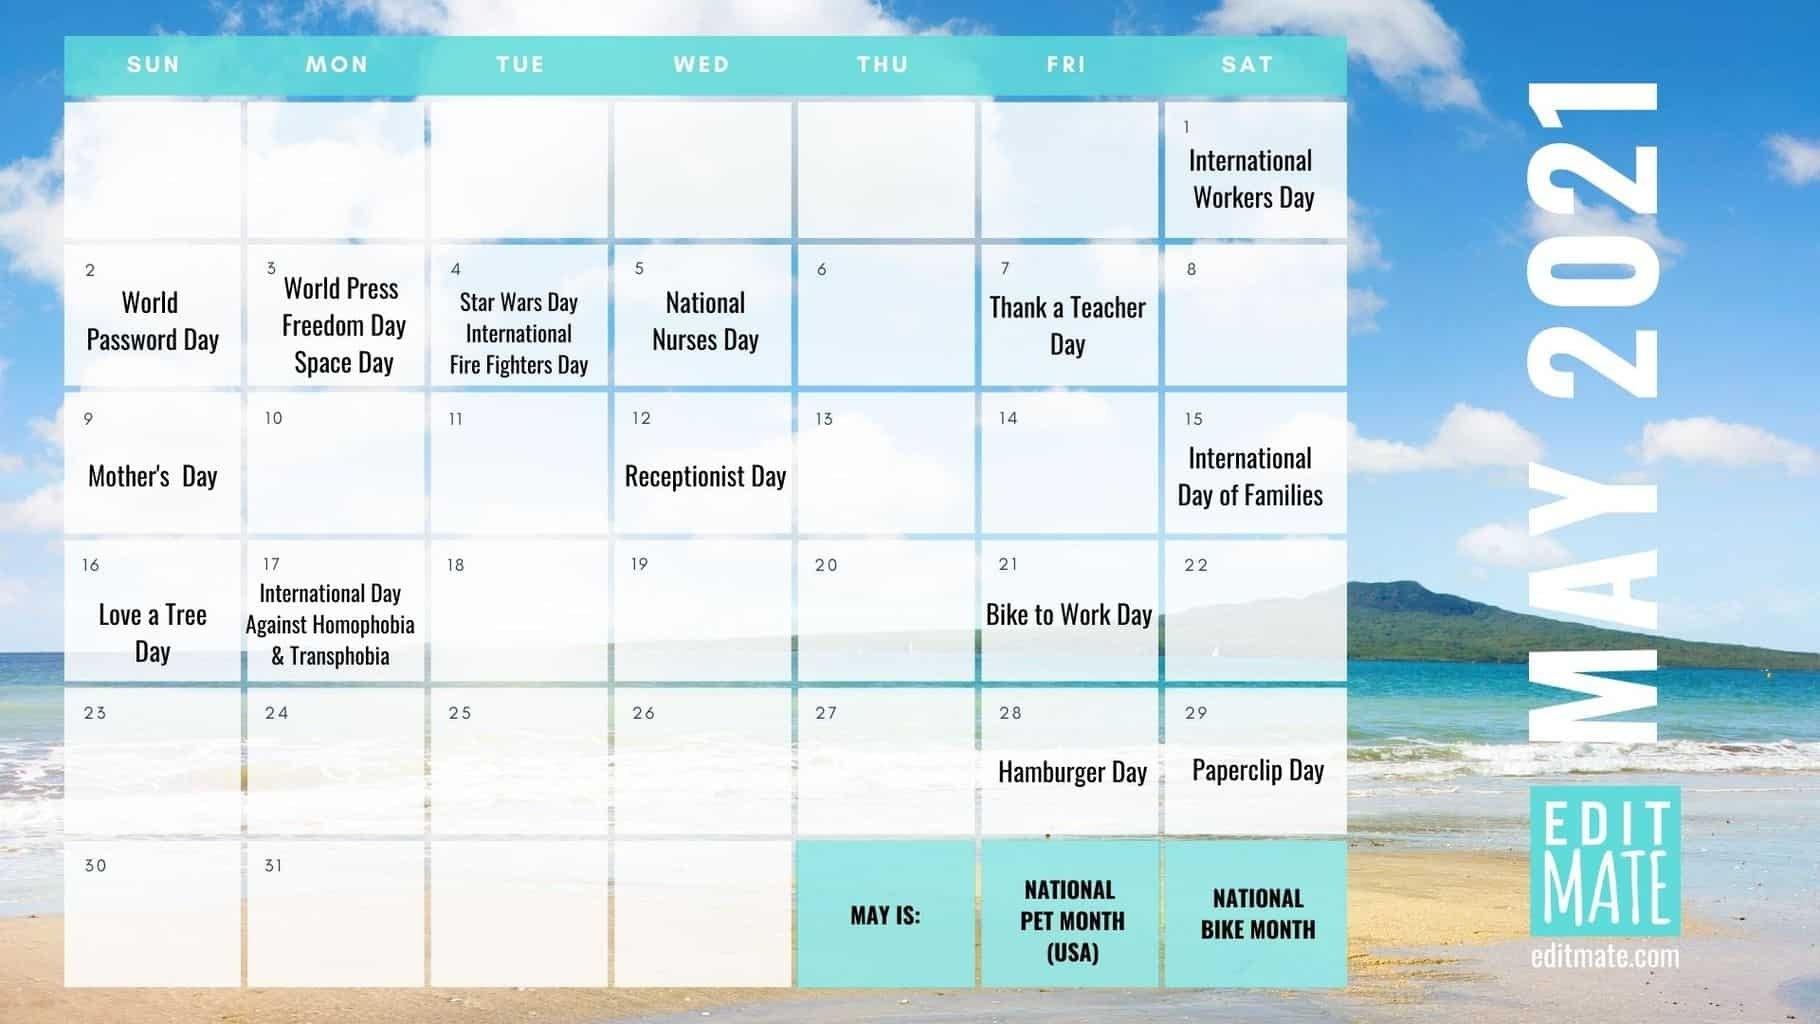 2021 Social Media Holiday Calendar | Editmate in 2021 Broadcast Calendar For Media Graphics